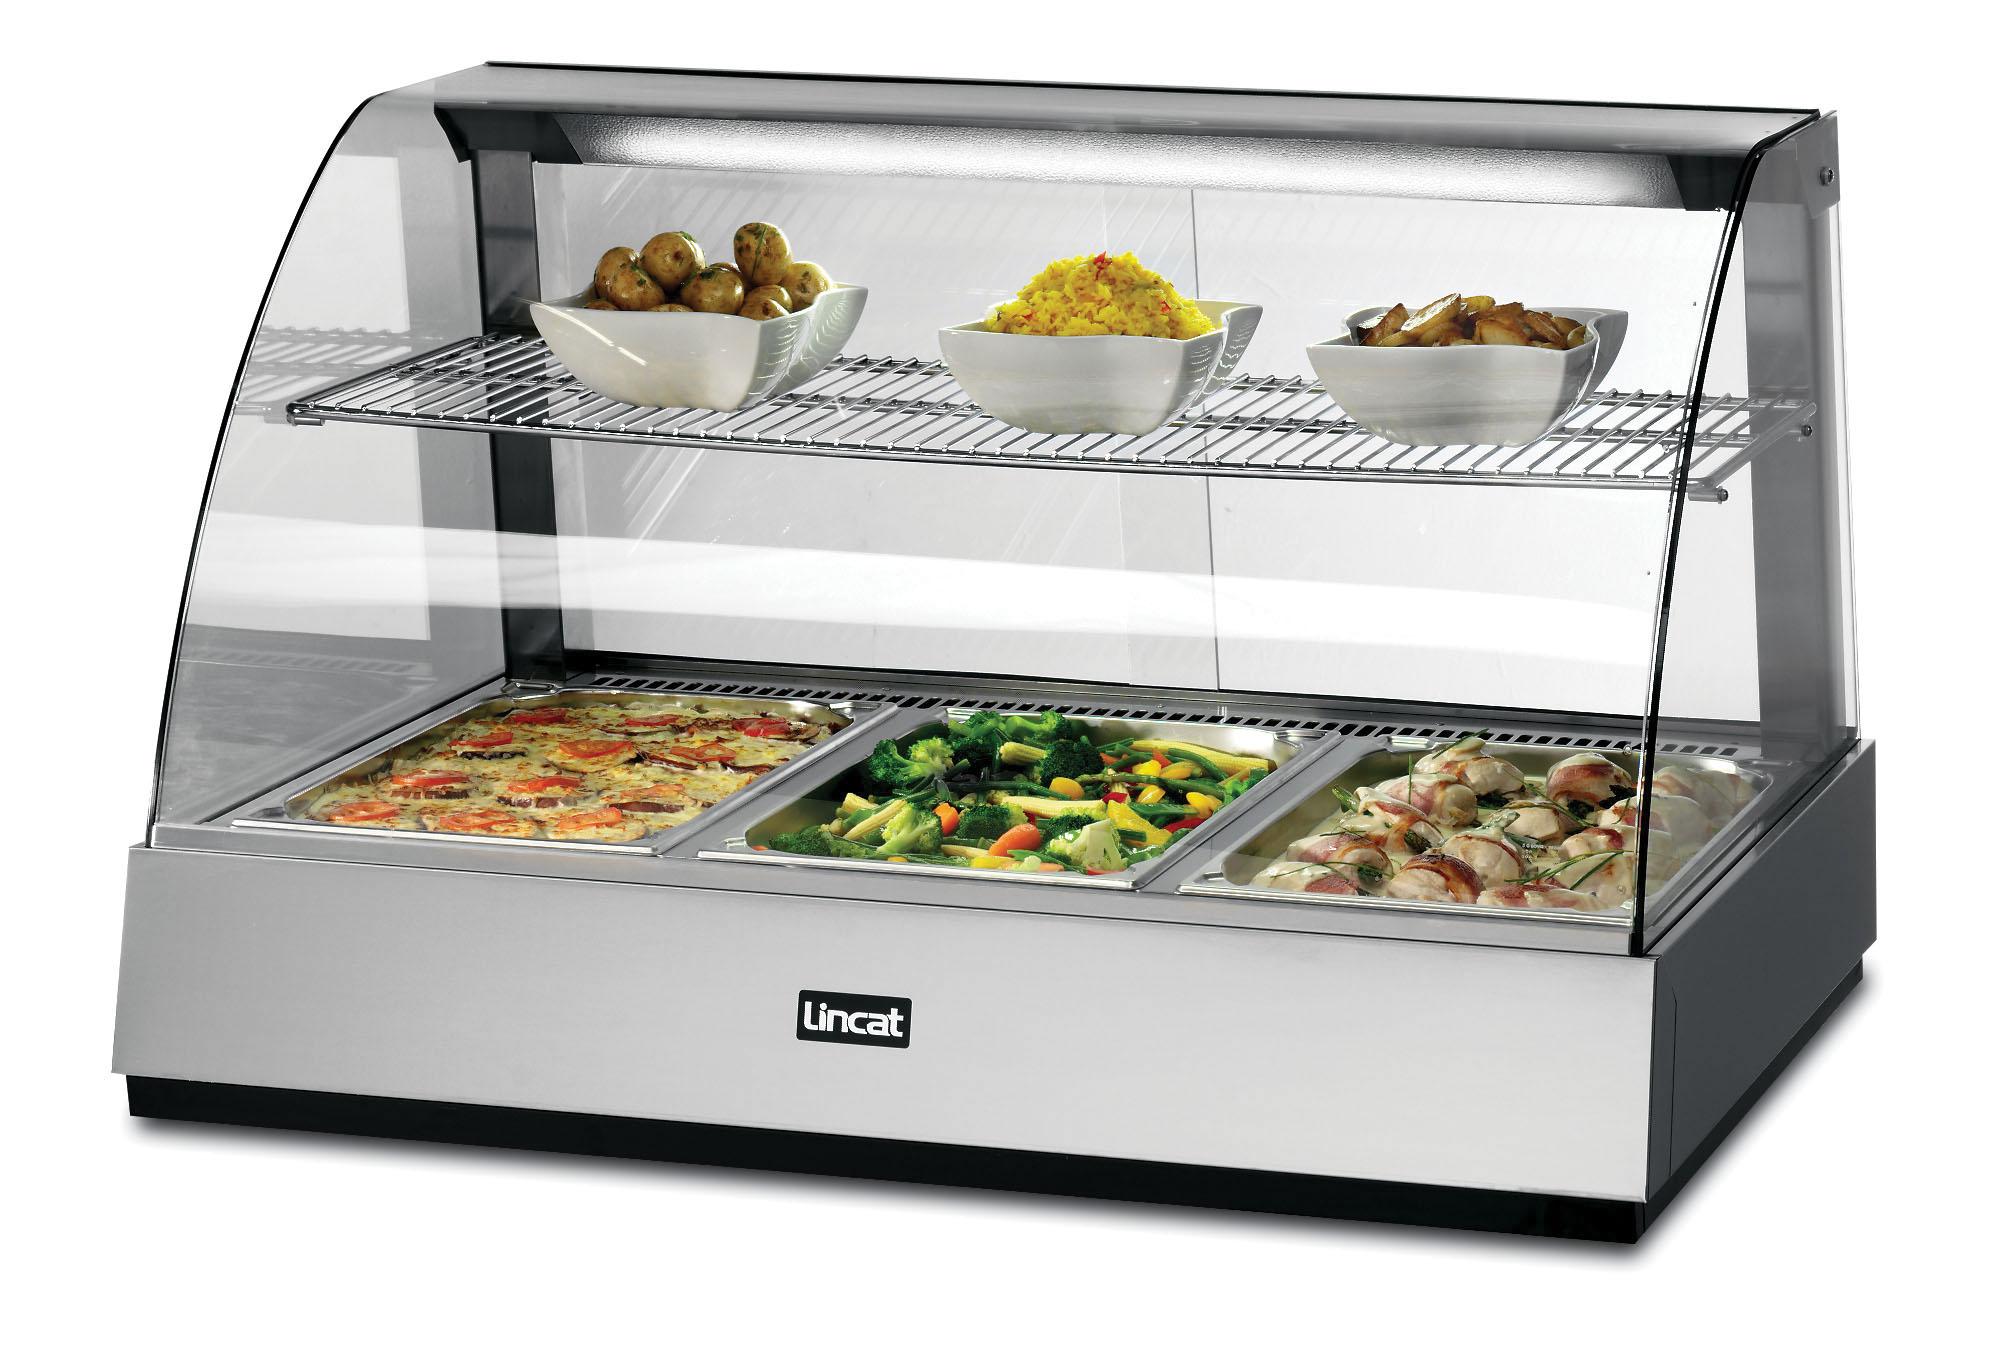 Starkey Product Categories Heated Food Display